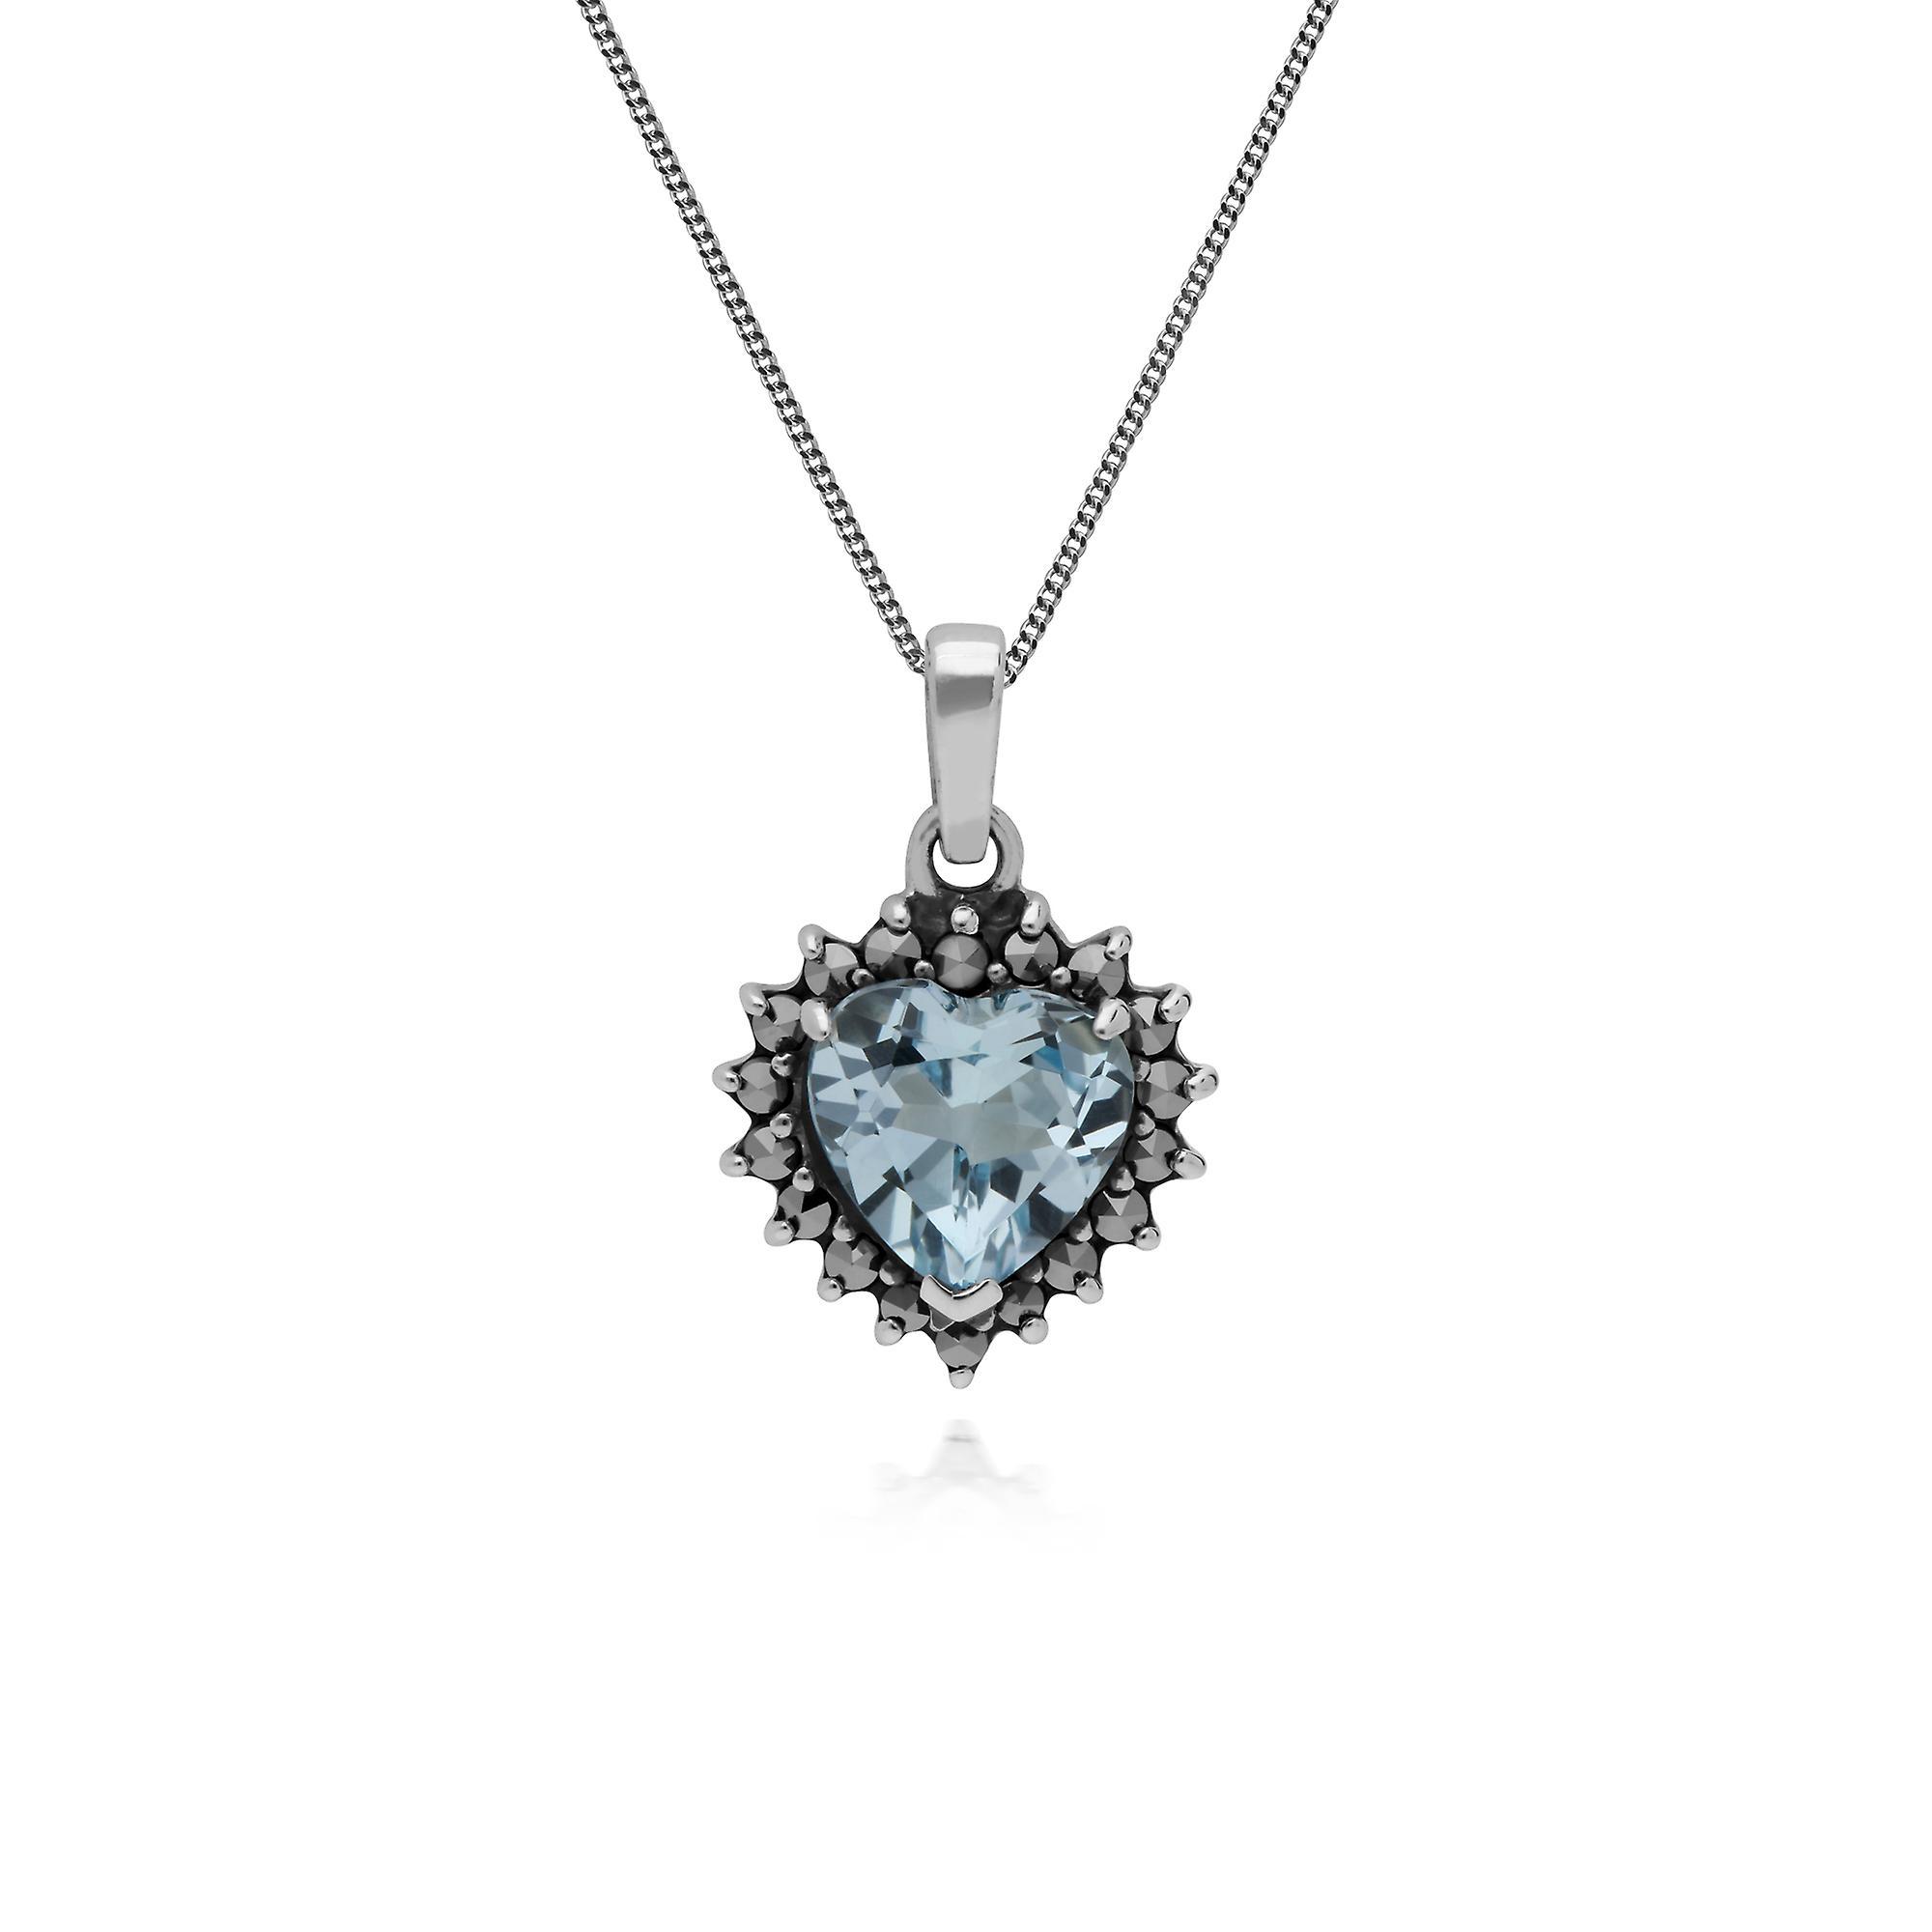 Gemondo Sterling Silver Blue Topaz & Marcasite Heart Pendant with 45cm Chain